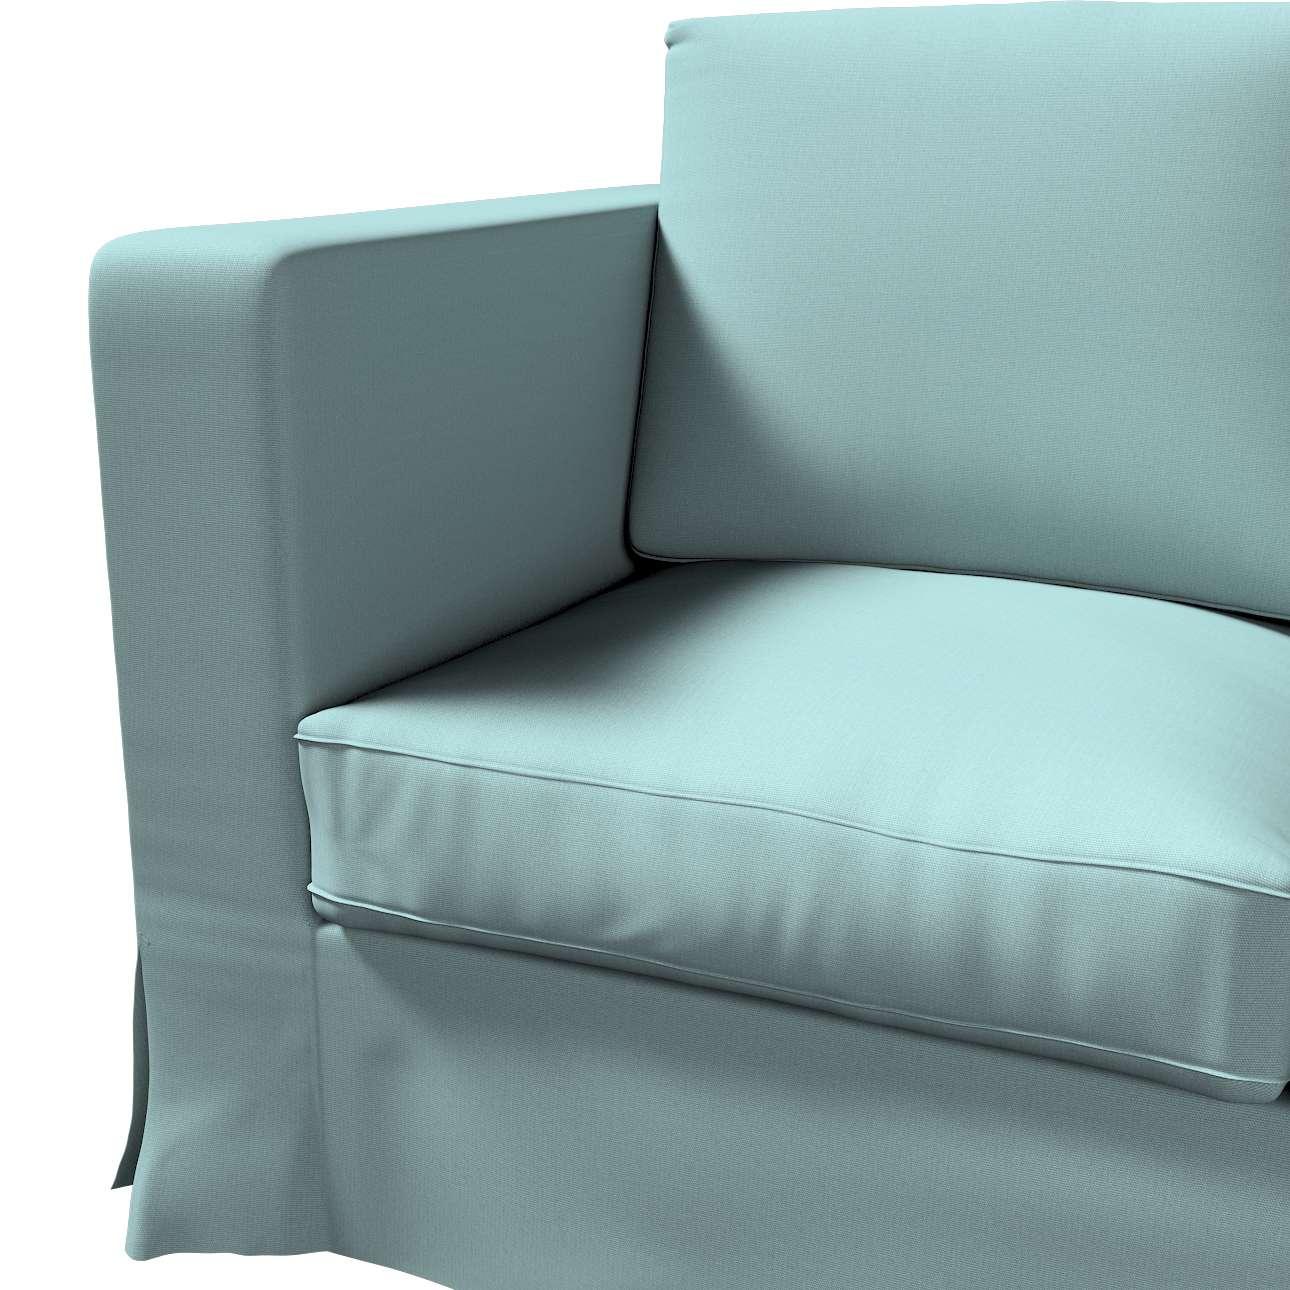 Karlanda klädsel 3-sits soffa - lång i kollektionen Panama Cotton, Tyg: 702-40